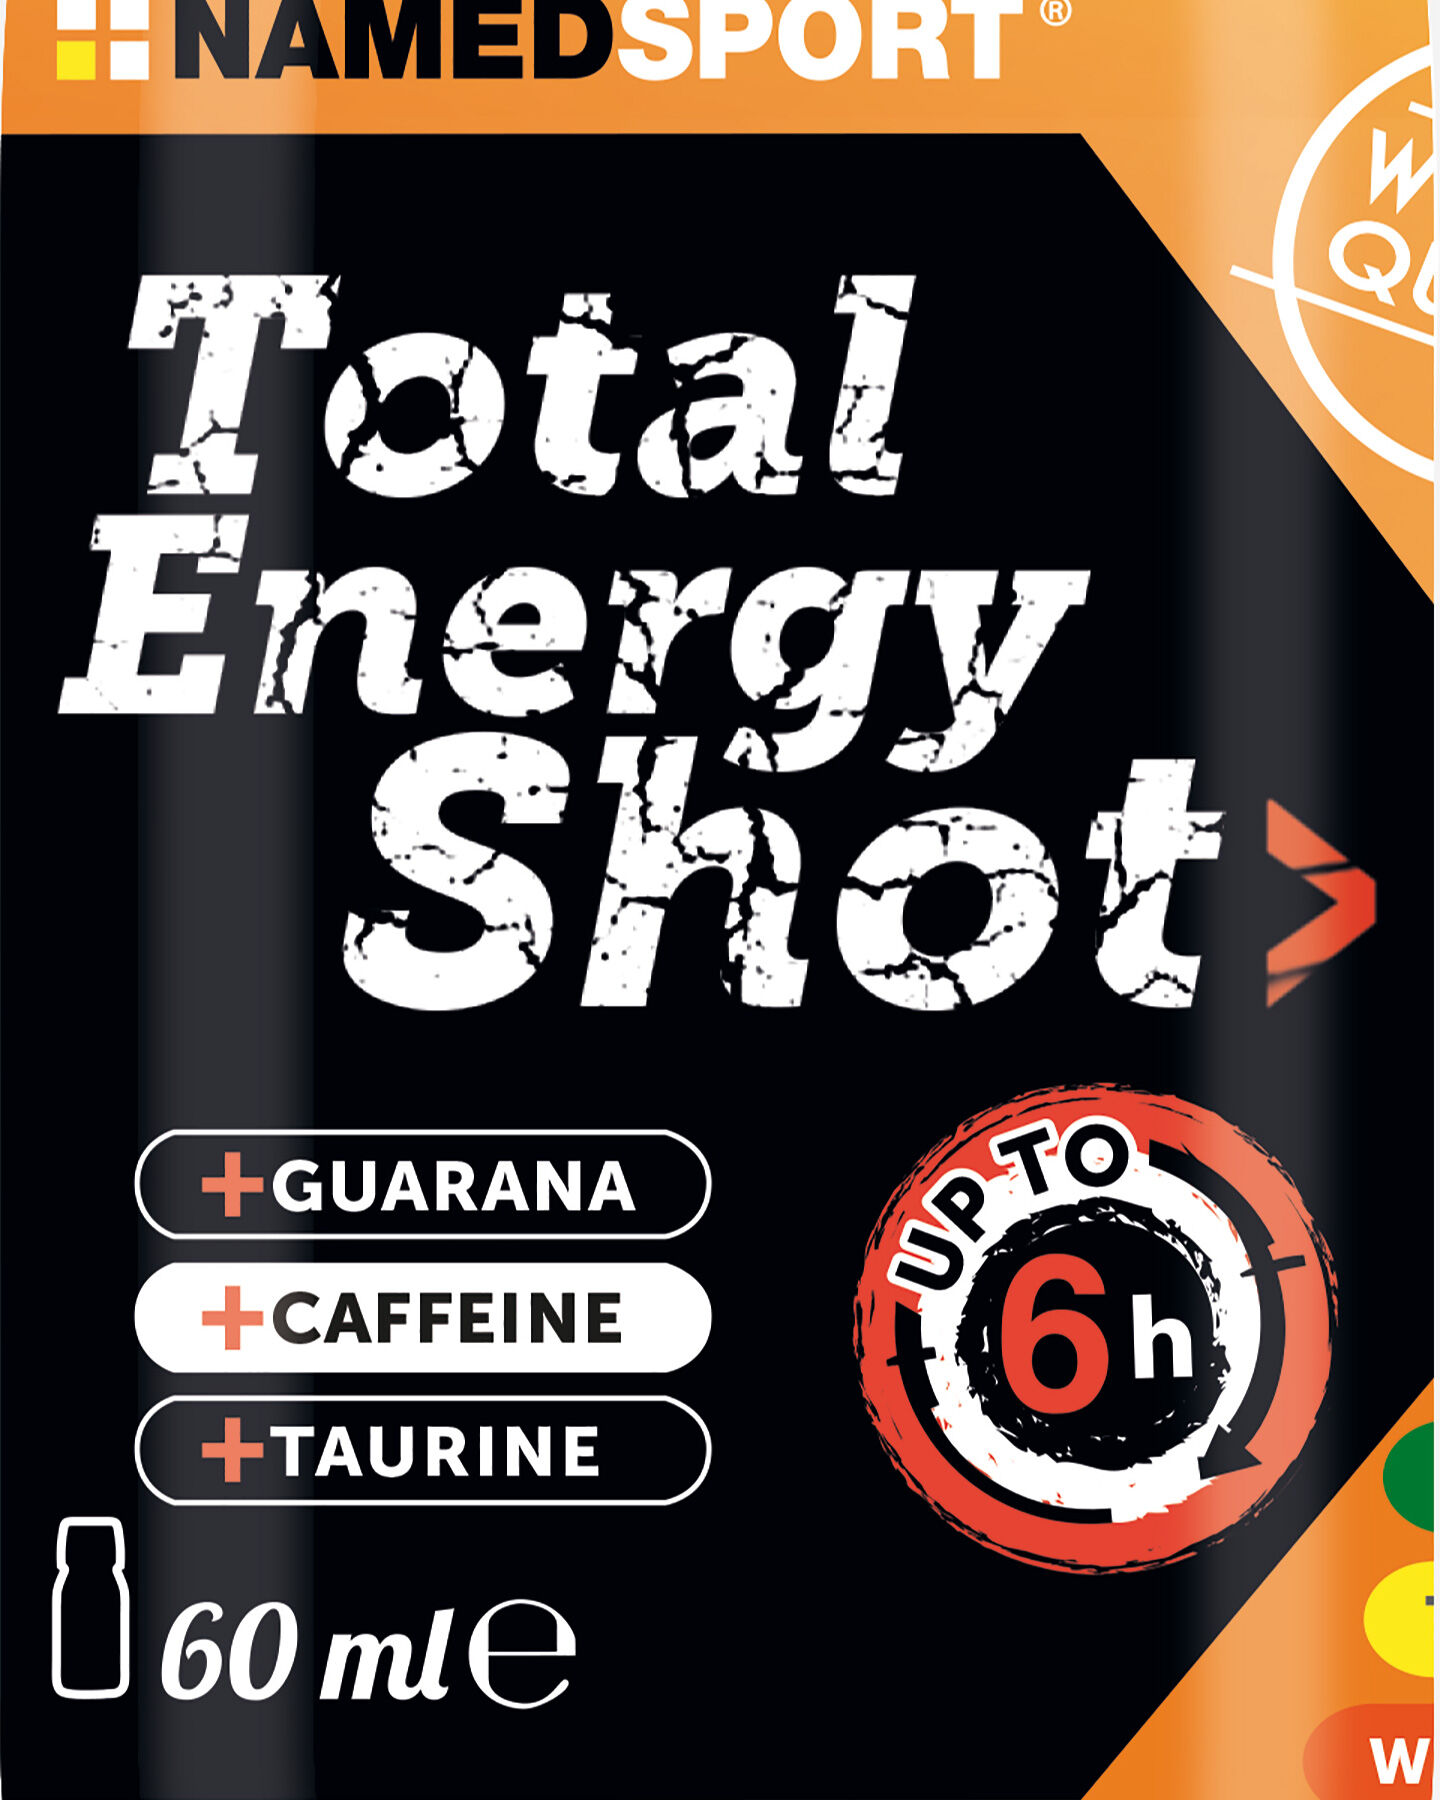 Energetico NAMED SPORT FLACONE 60ML ORANGE S1309068 1 UNI scatto 2